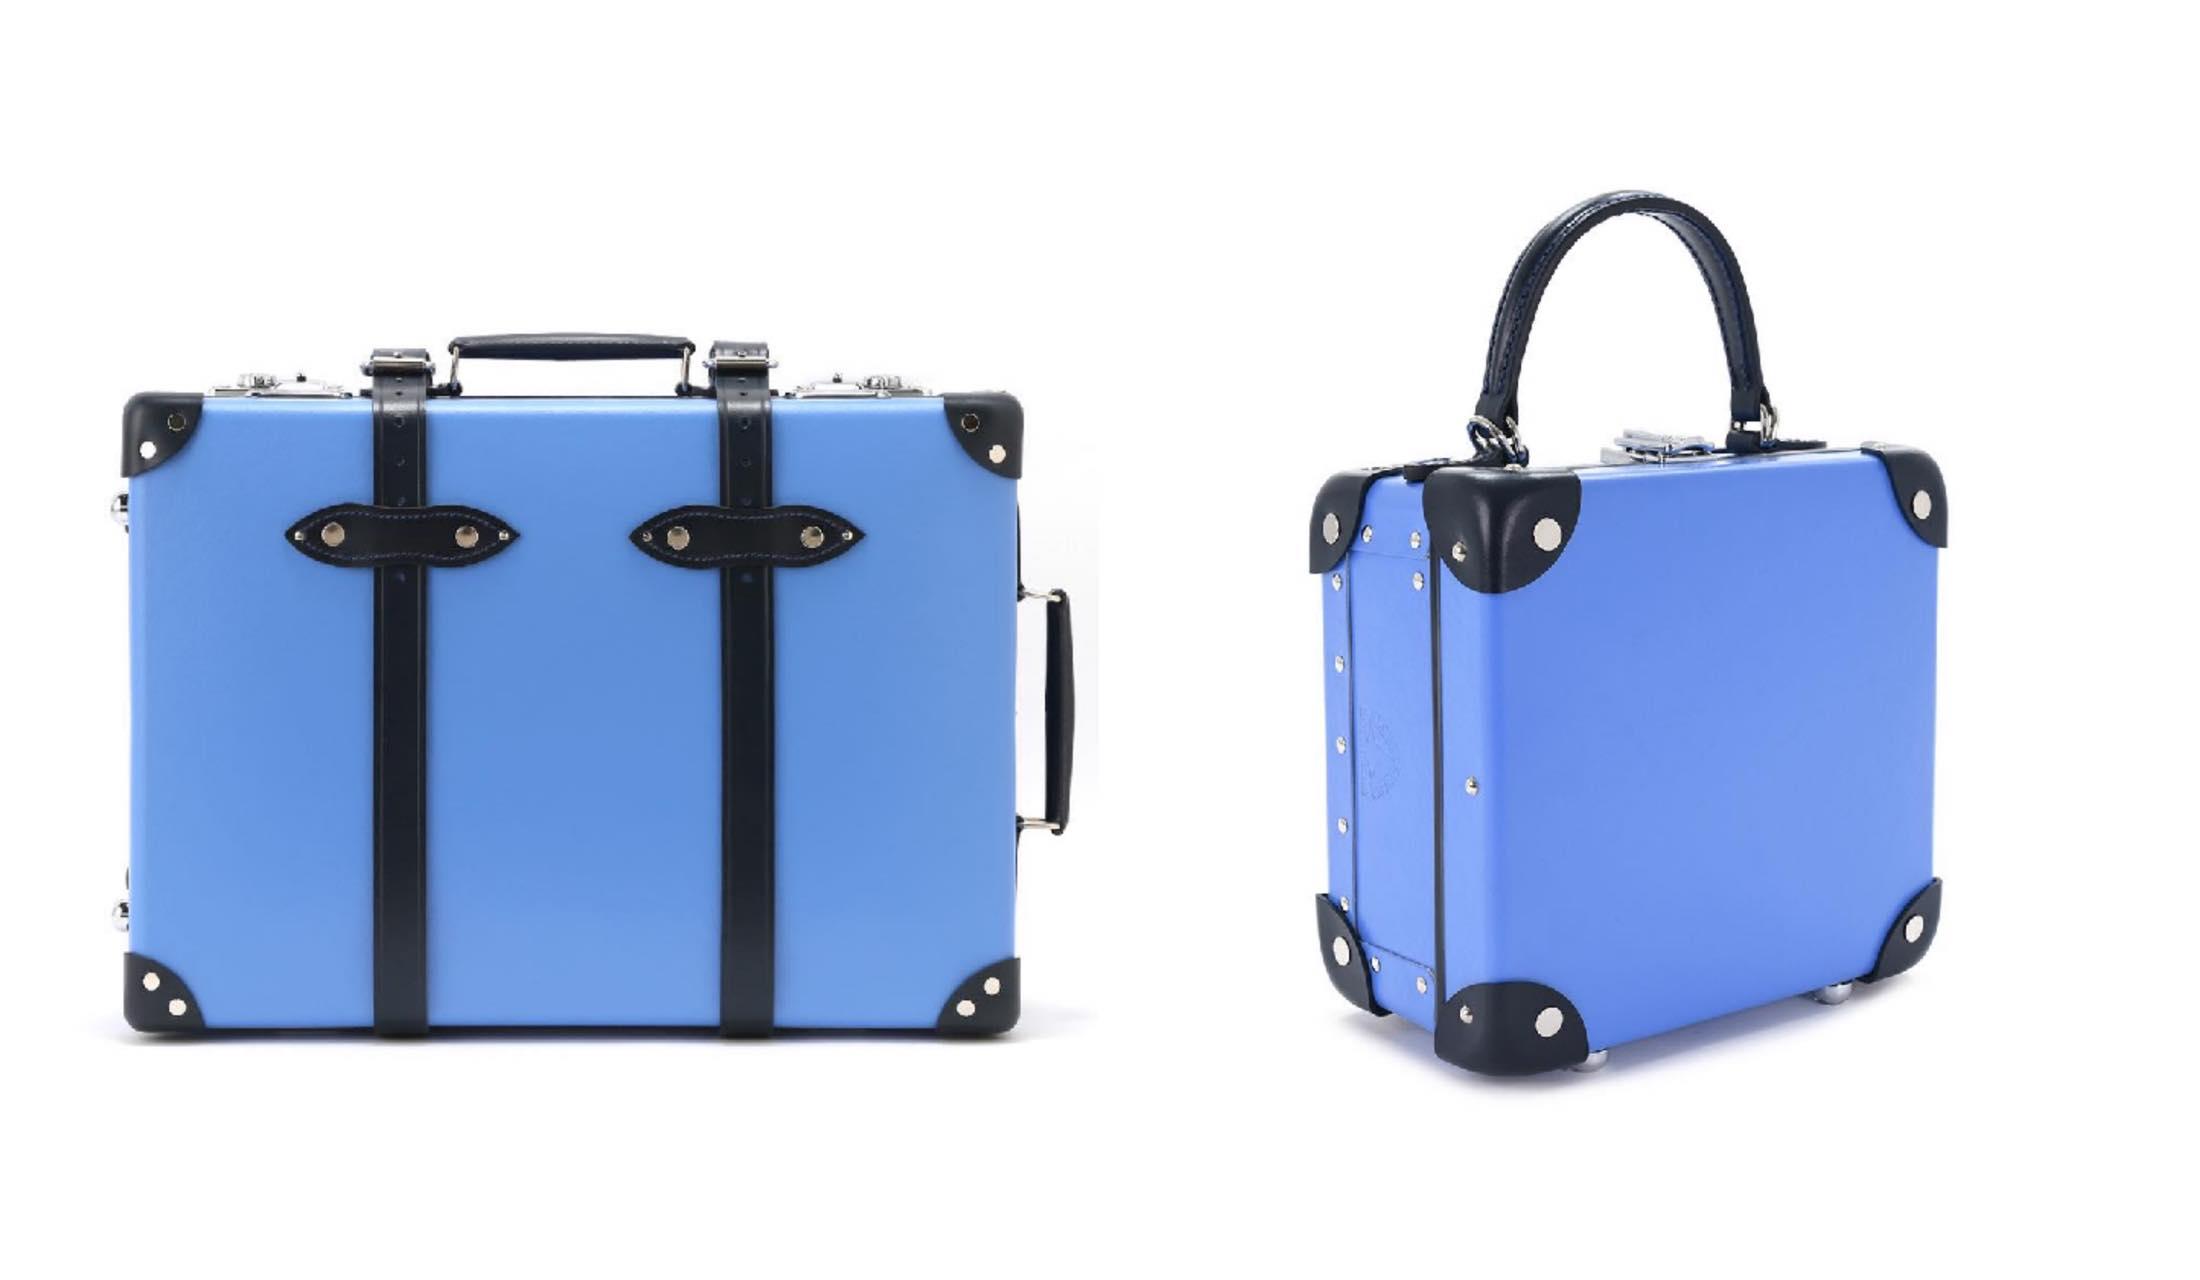 Globe -Trotter(グローブ・トロッター)のトロリーケースとバッグの写真